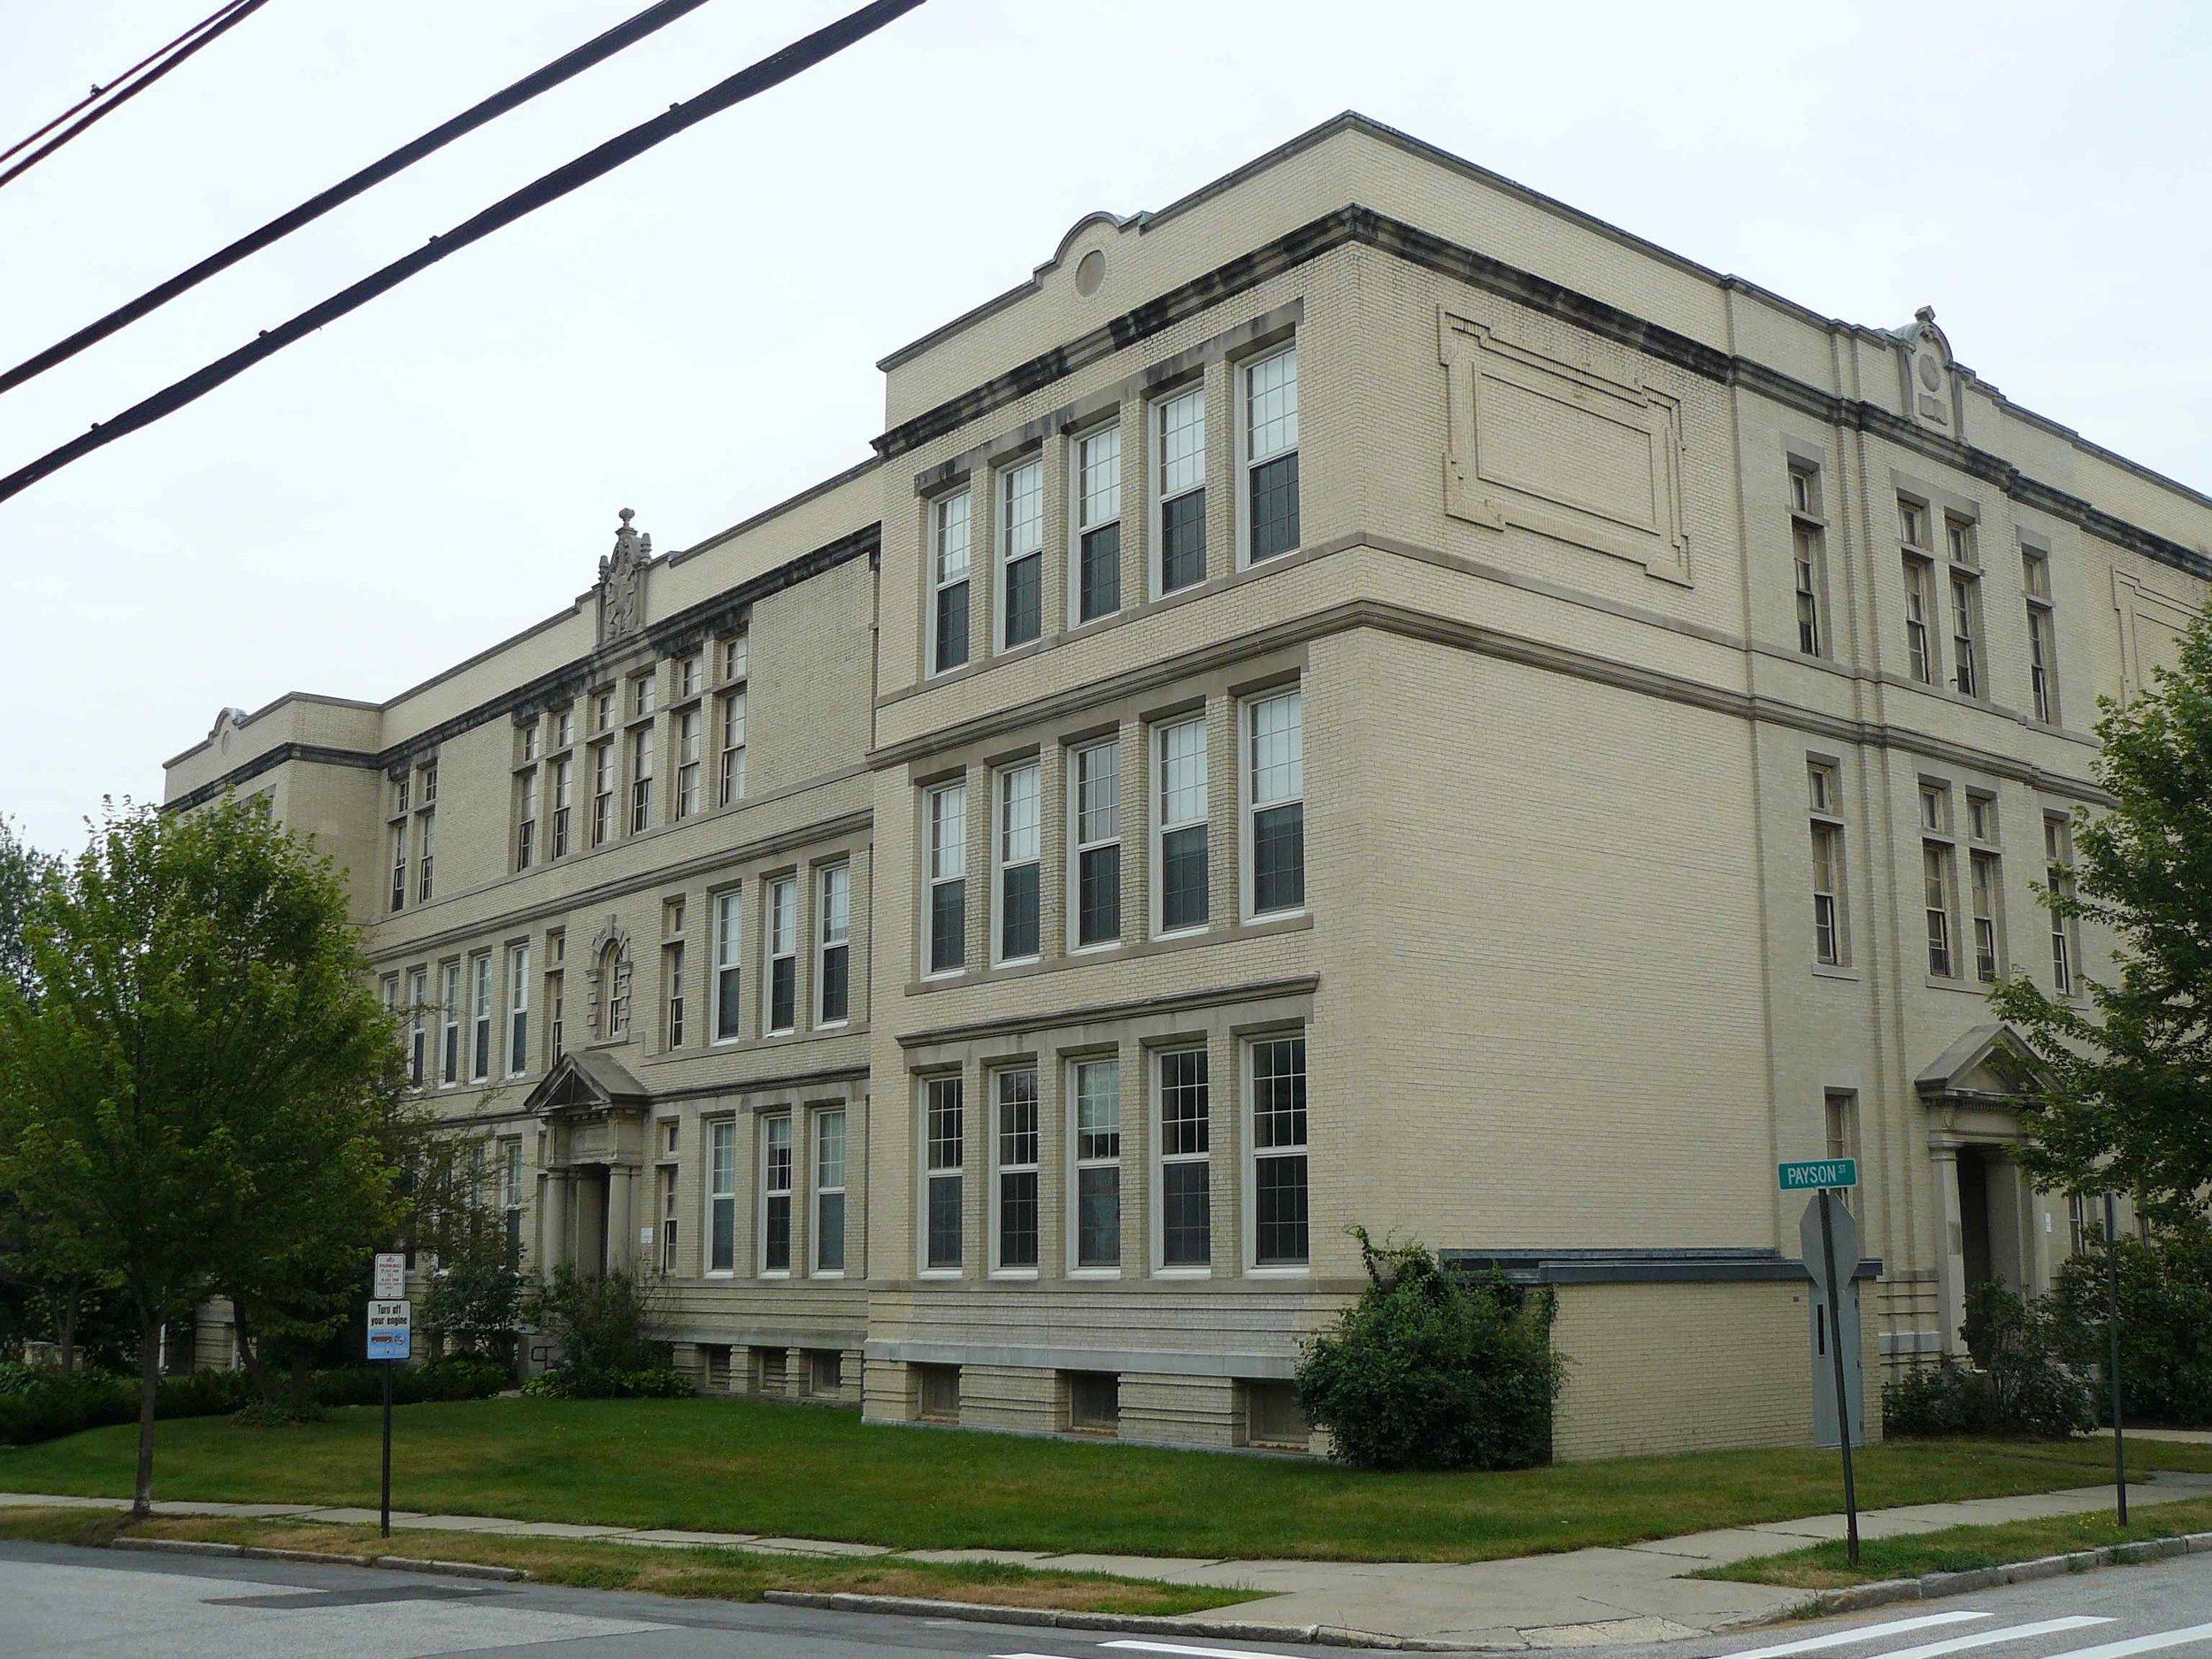 Nathan Clifford School, Falmouth Street, Portland,  Photo by Greater Portland Landmarks